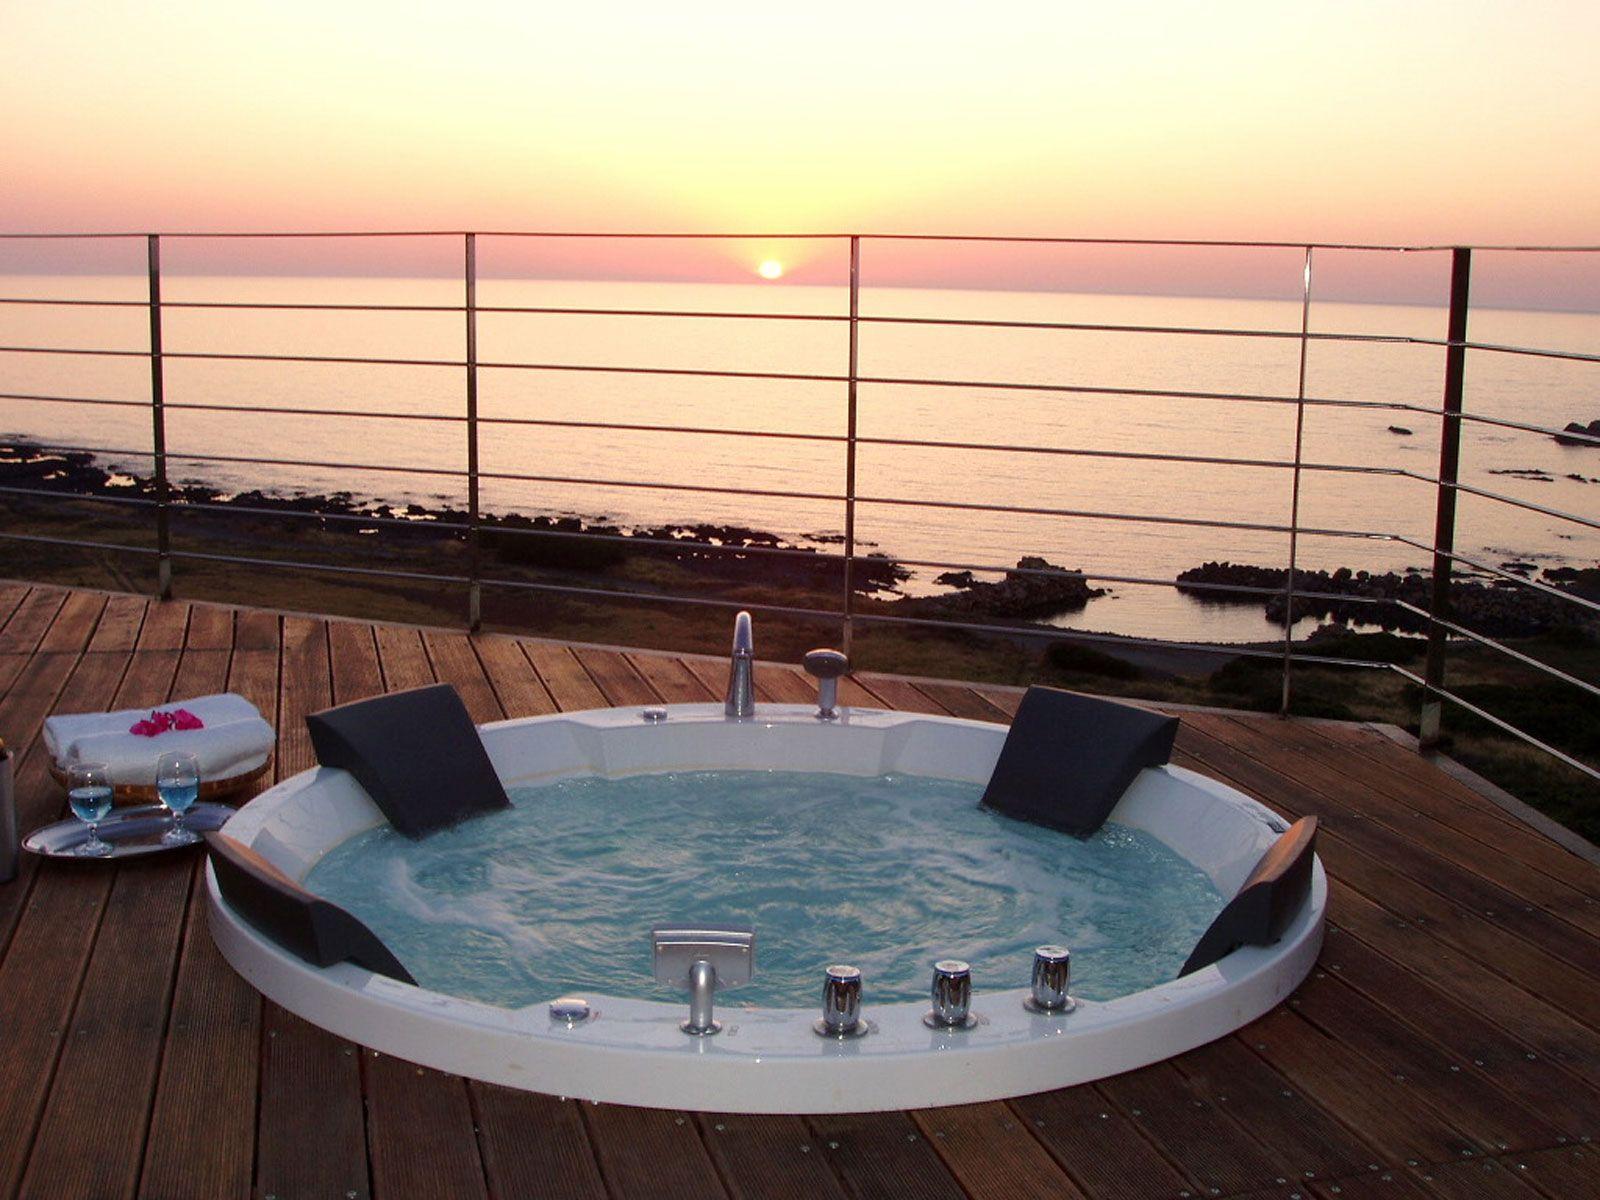 elafonisi villas villa ostria the outdoor jacuzzi spa. Black Bedroom Furniture Sets. Home Design Ideas